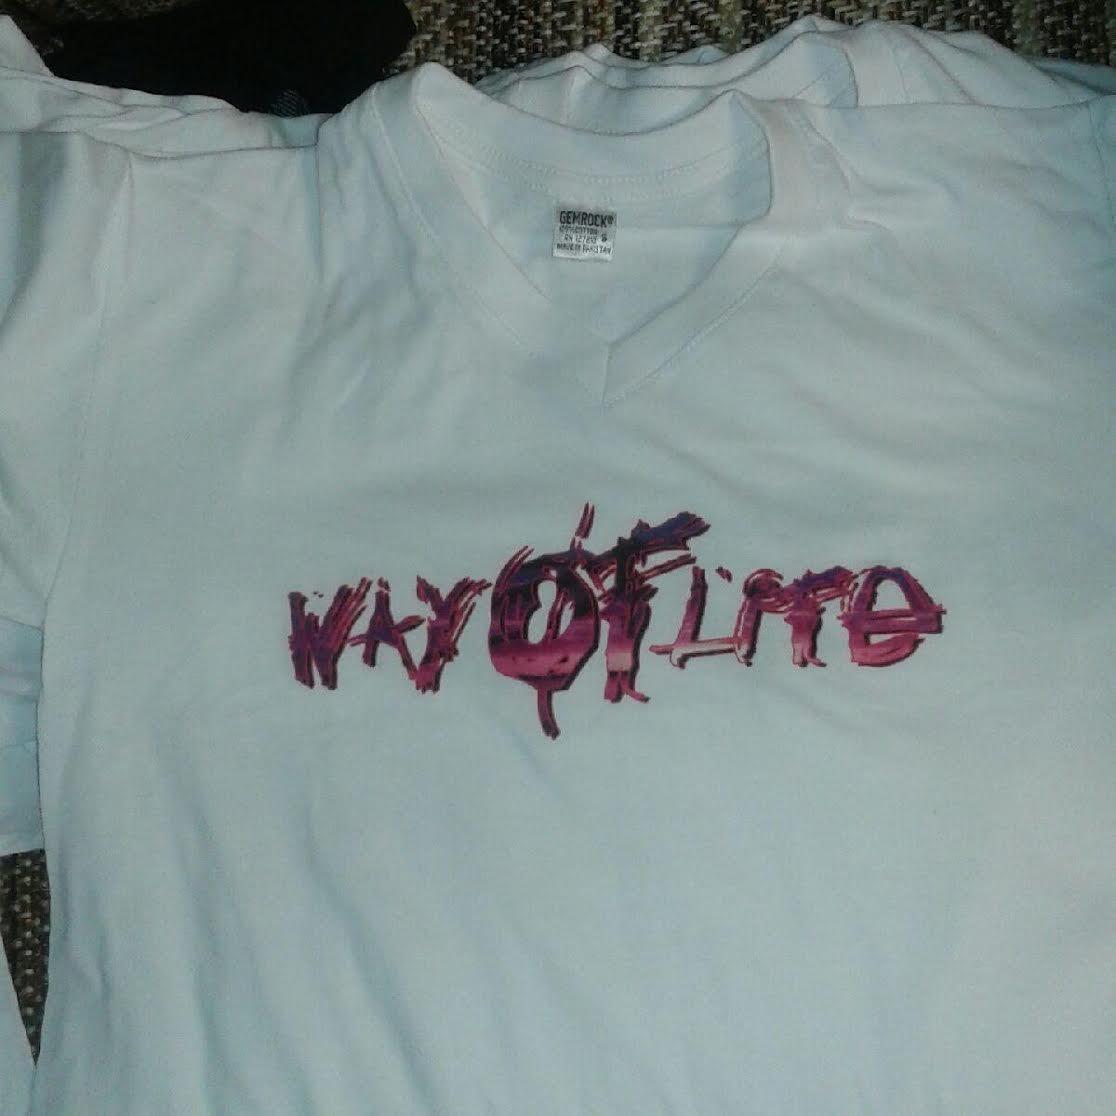 way-of-life-band-apparel